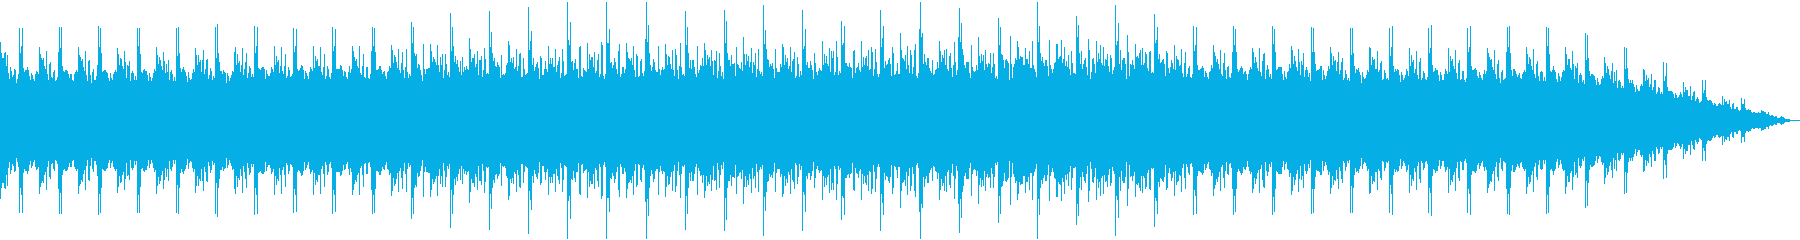 depthの再生済みの波形